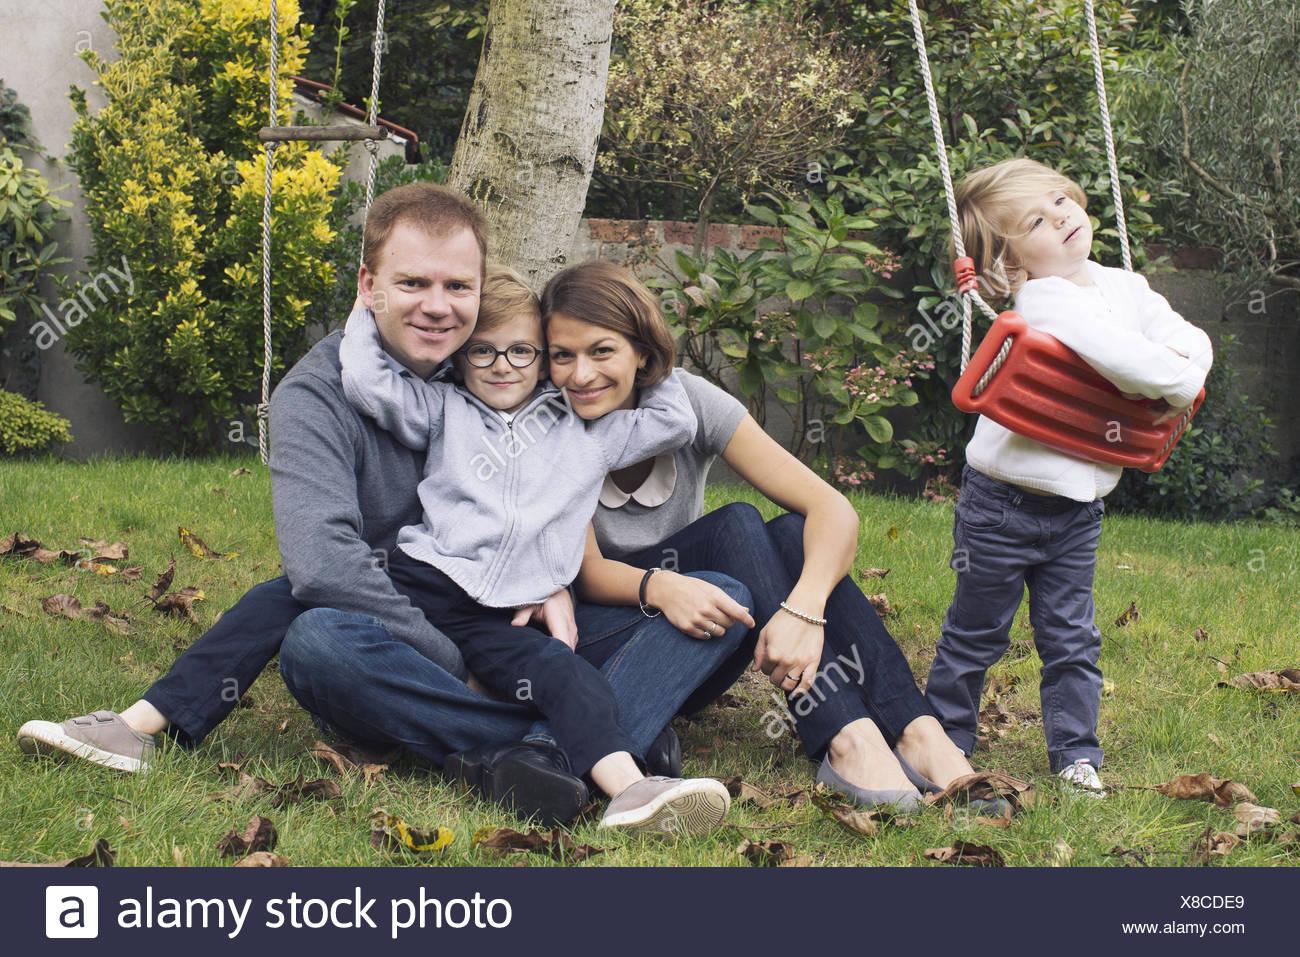 Familiy in park, portrait - Stock Image